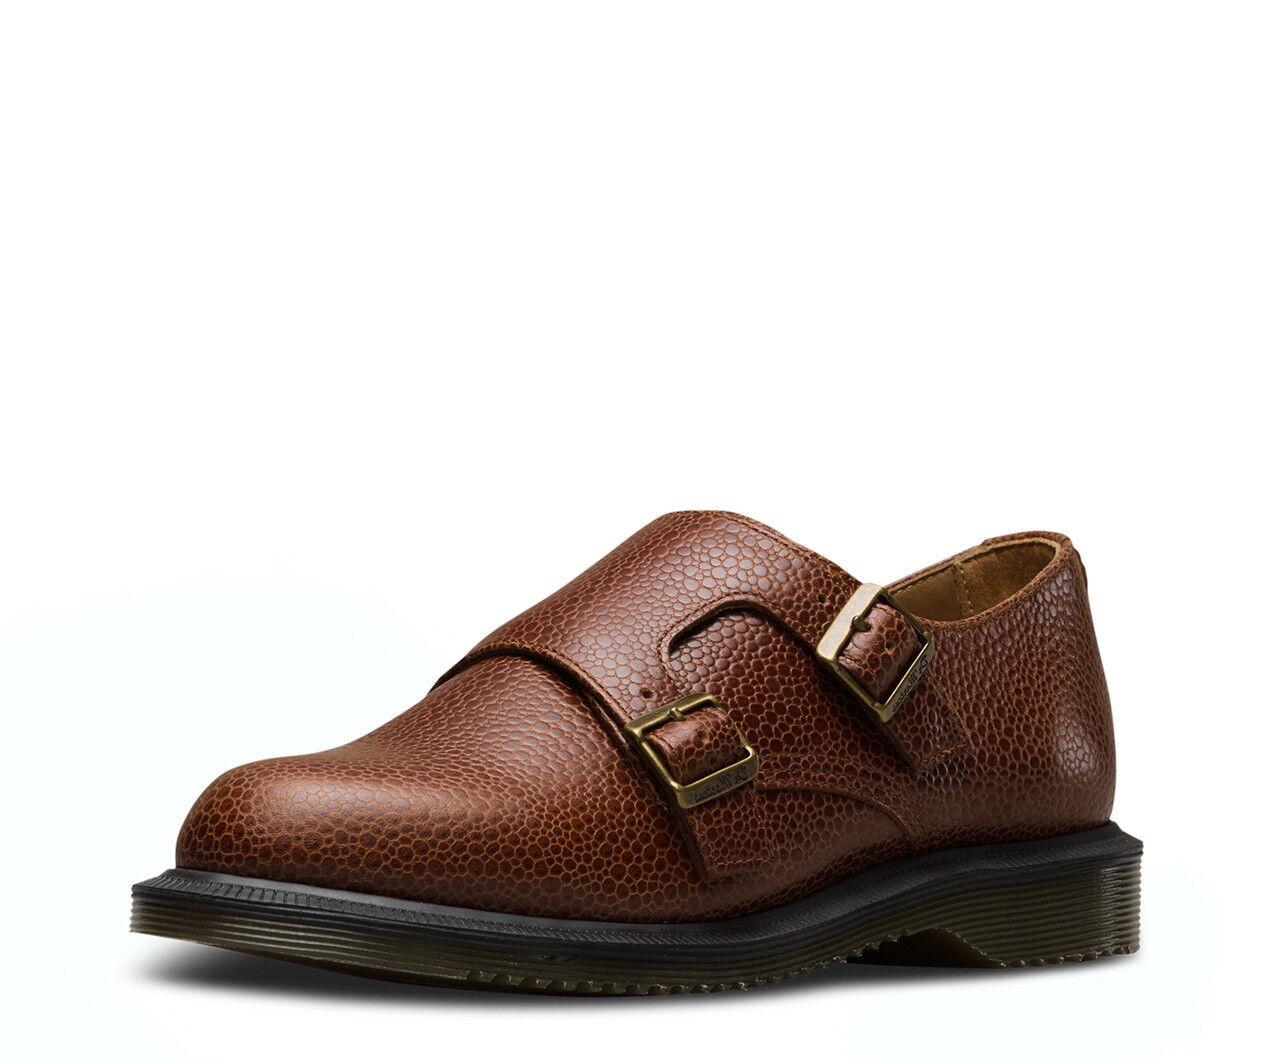 Dr. Martens Pandora Monk Double Strap Chestnut Brown Leather shoes 7 Womens